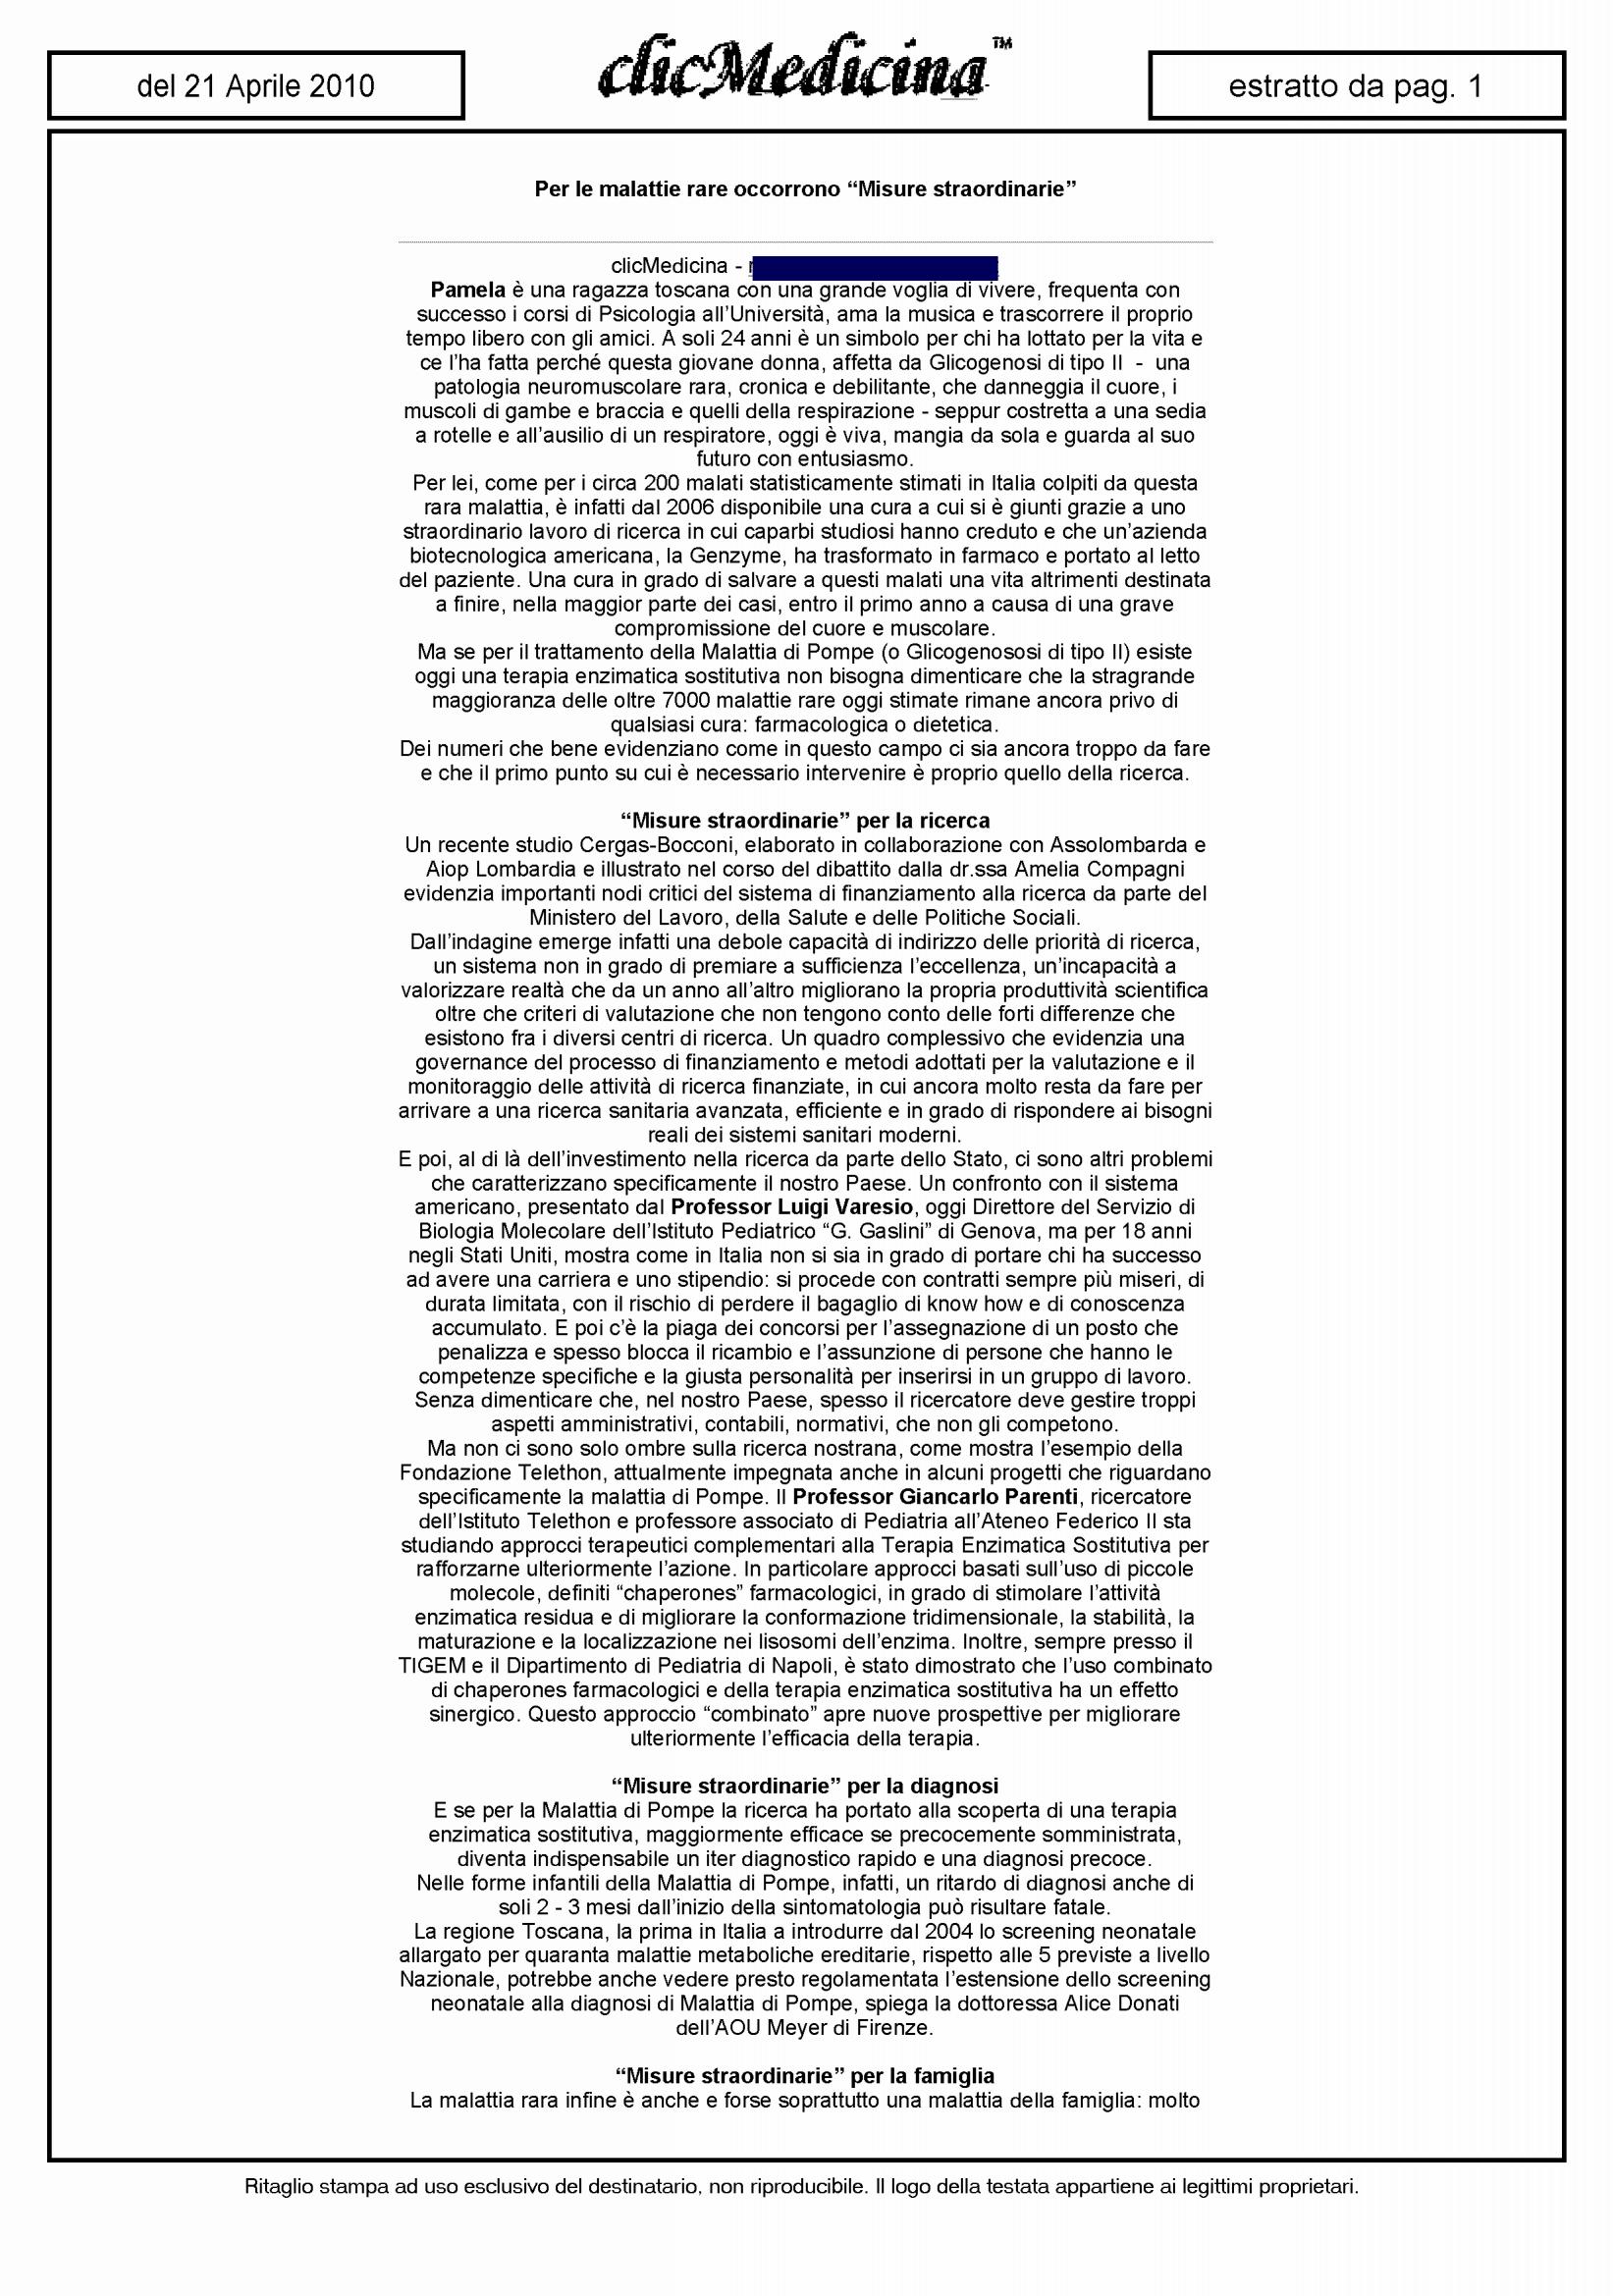 Stampa_20100422_misure straordinarie_Page_22